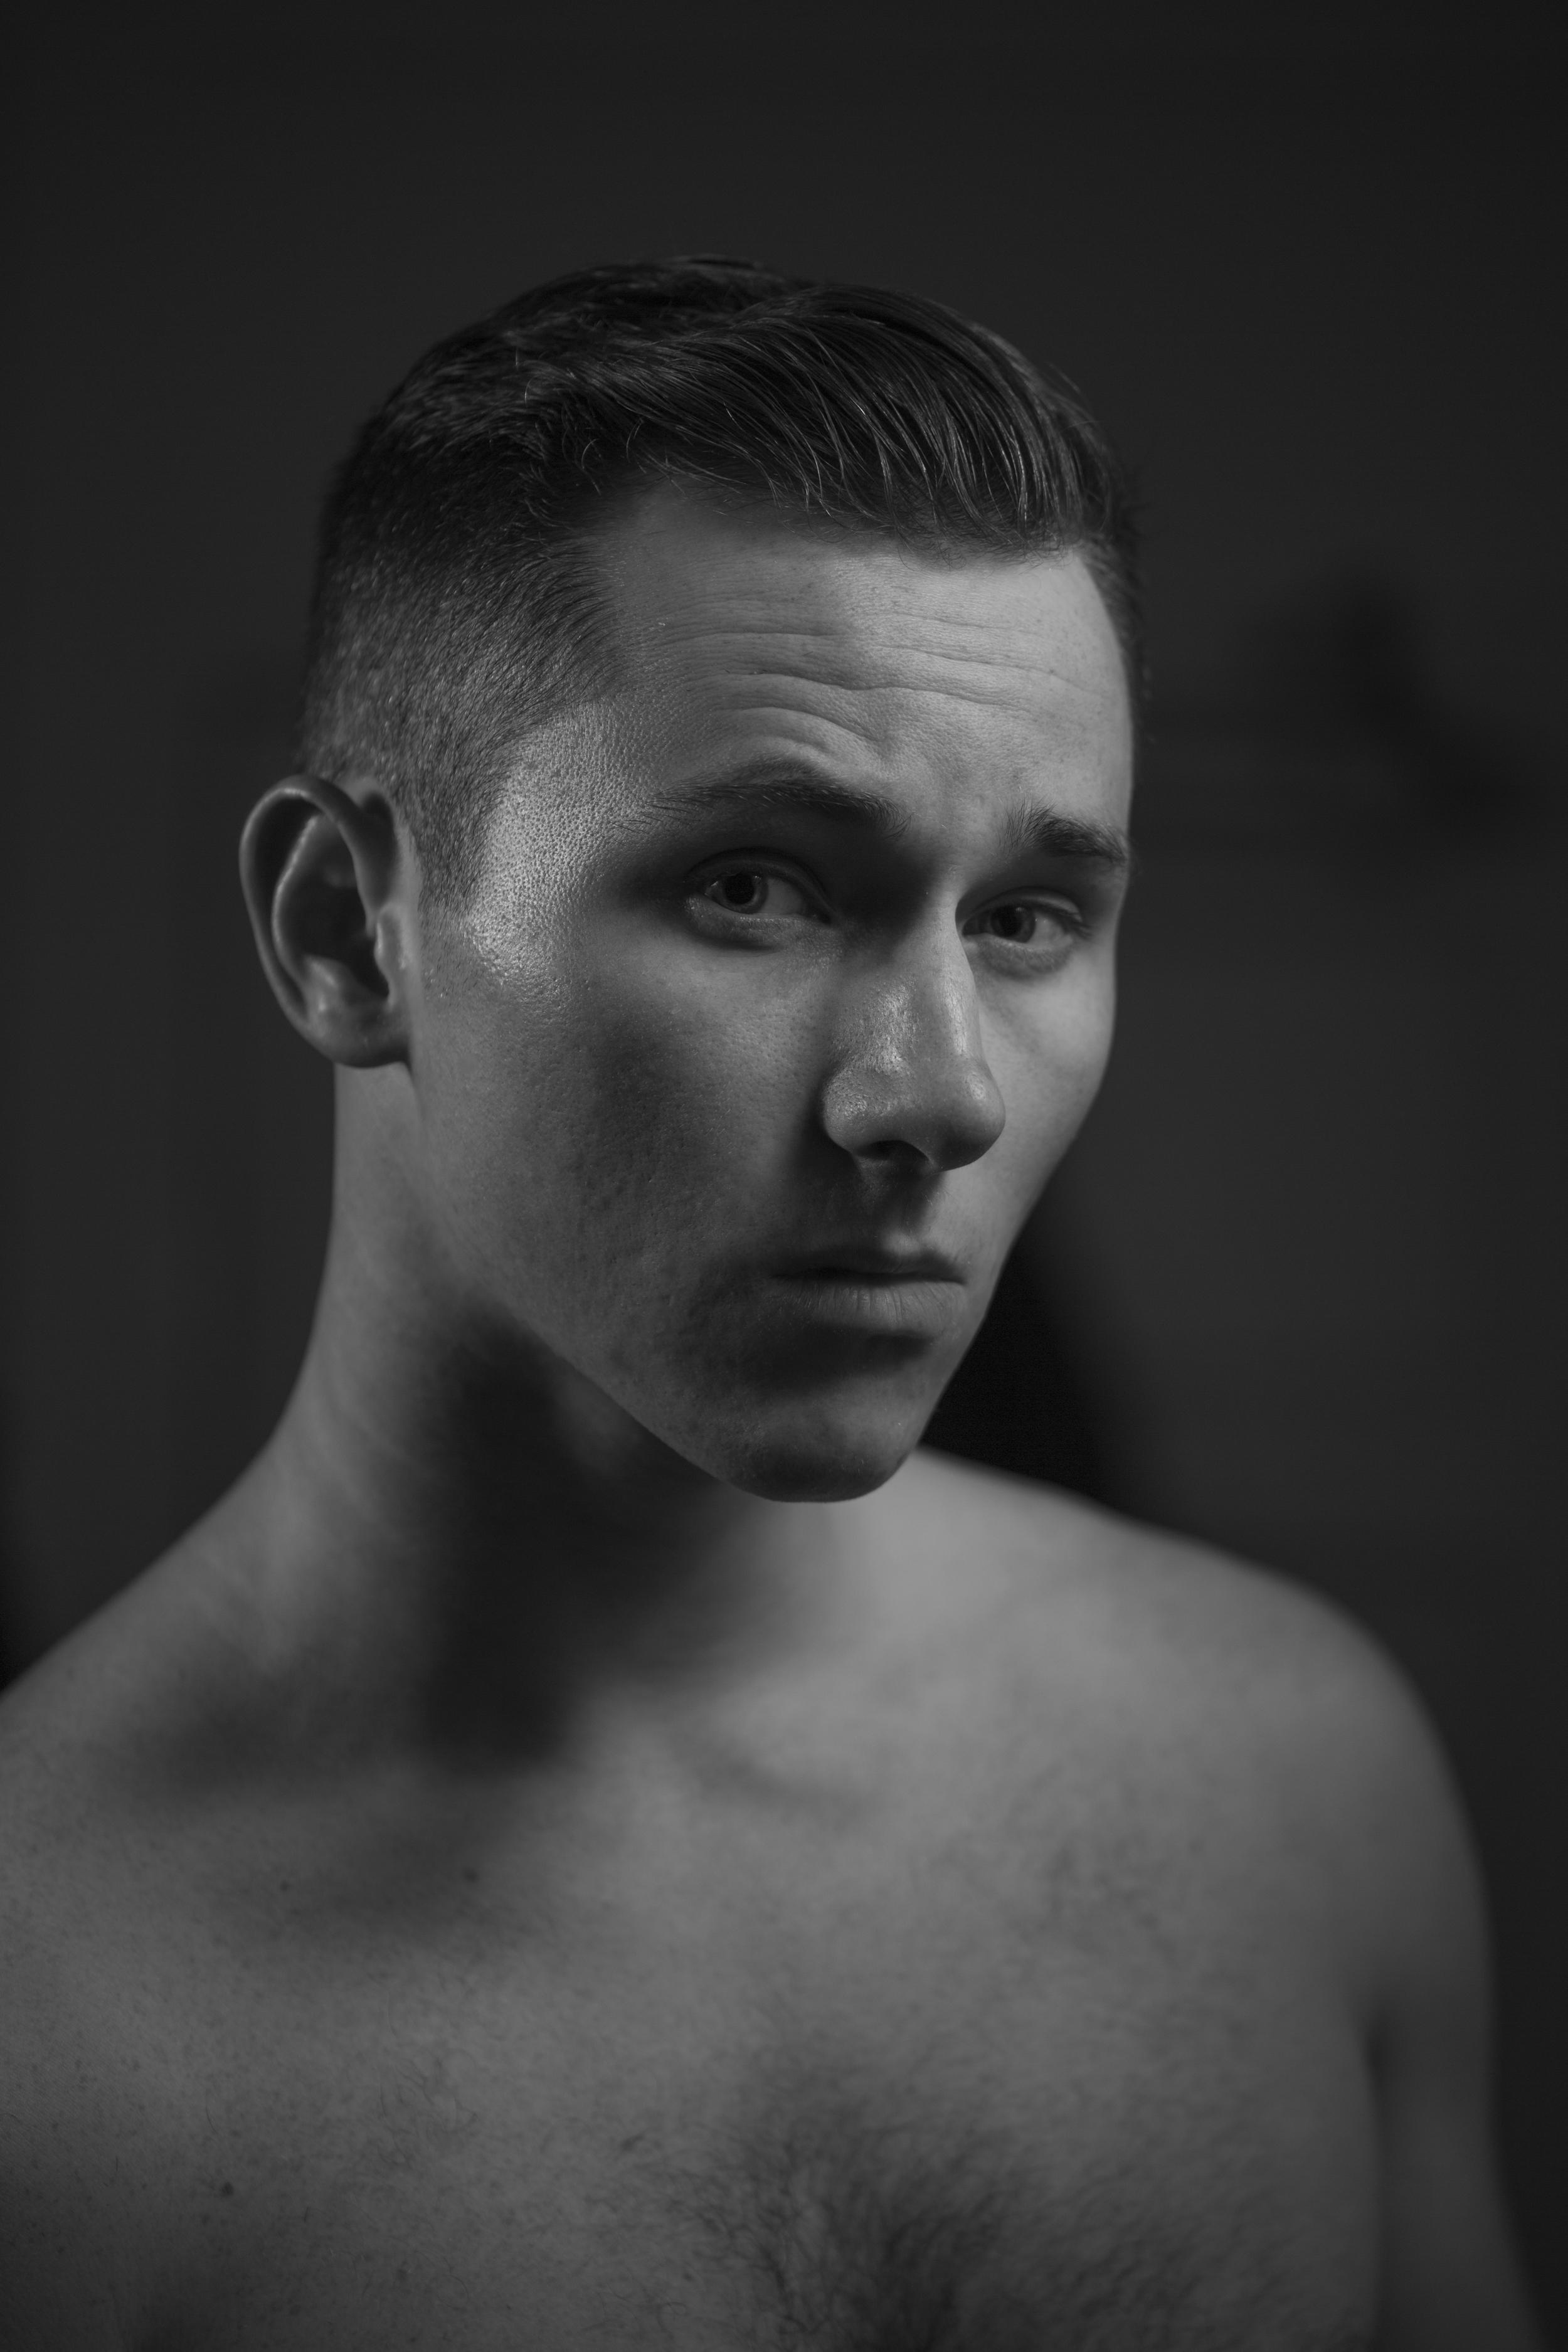 Shaving-096-Edit.jpg